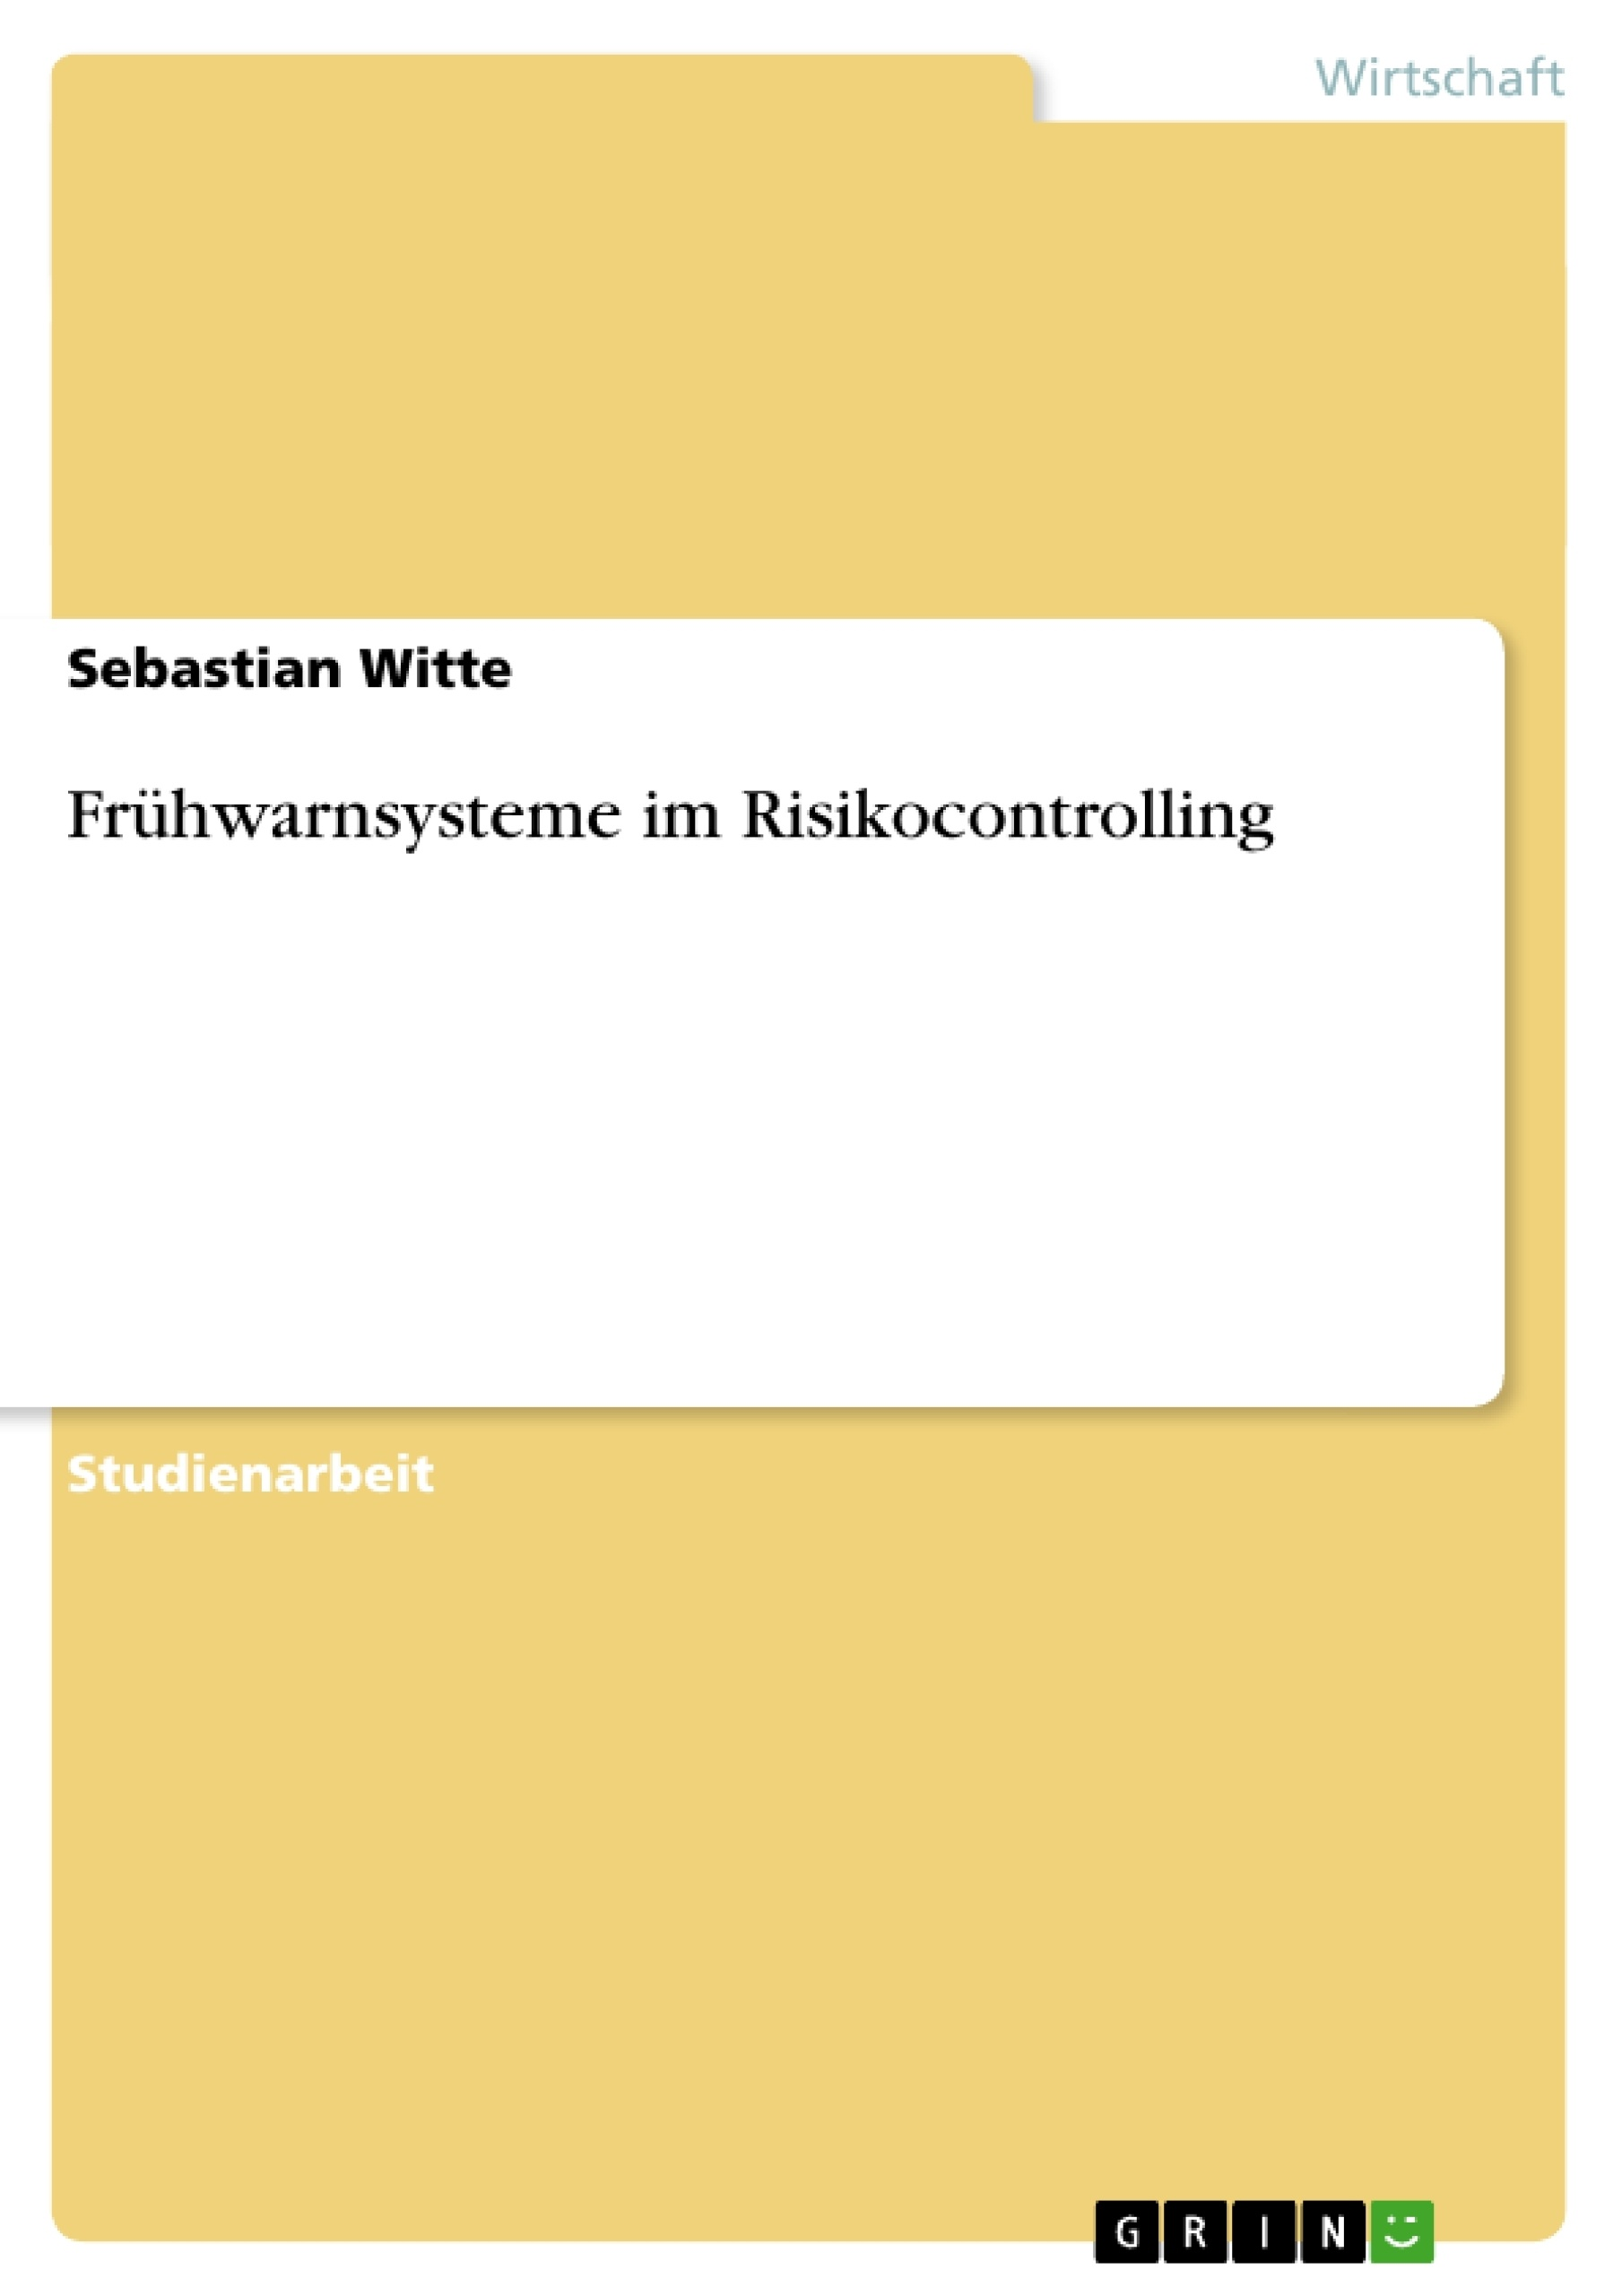 Titel: Frühwarnsysteme im Risikocontrolling